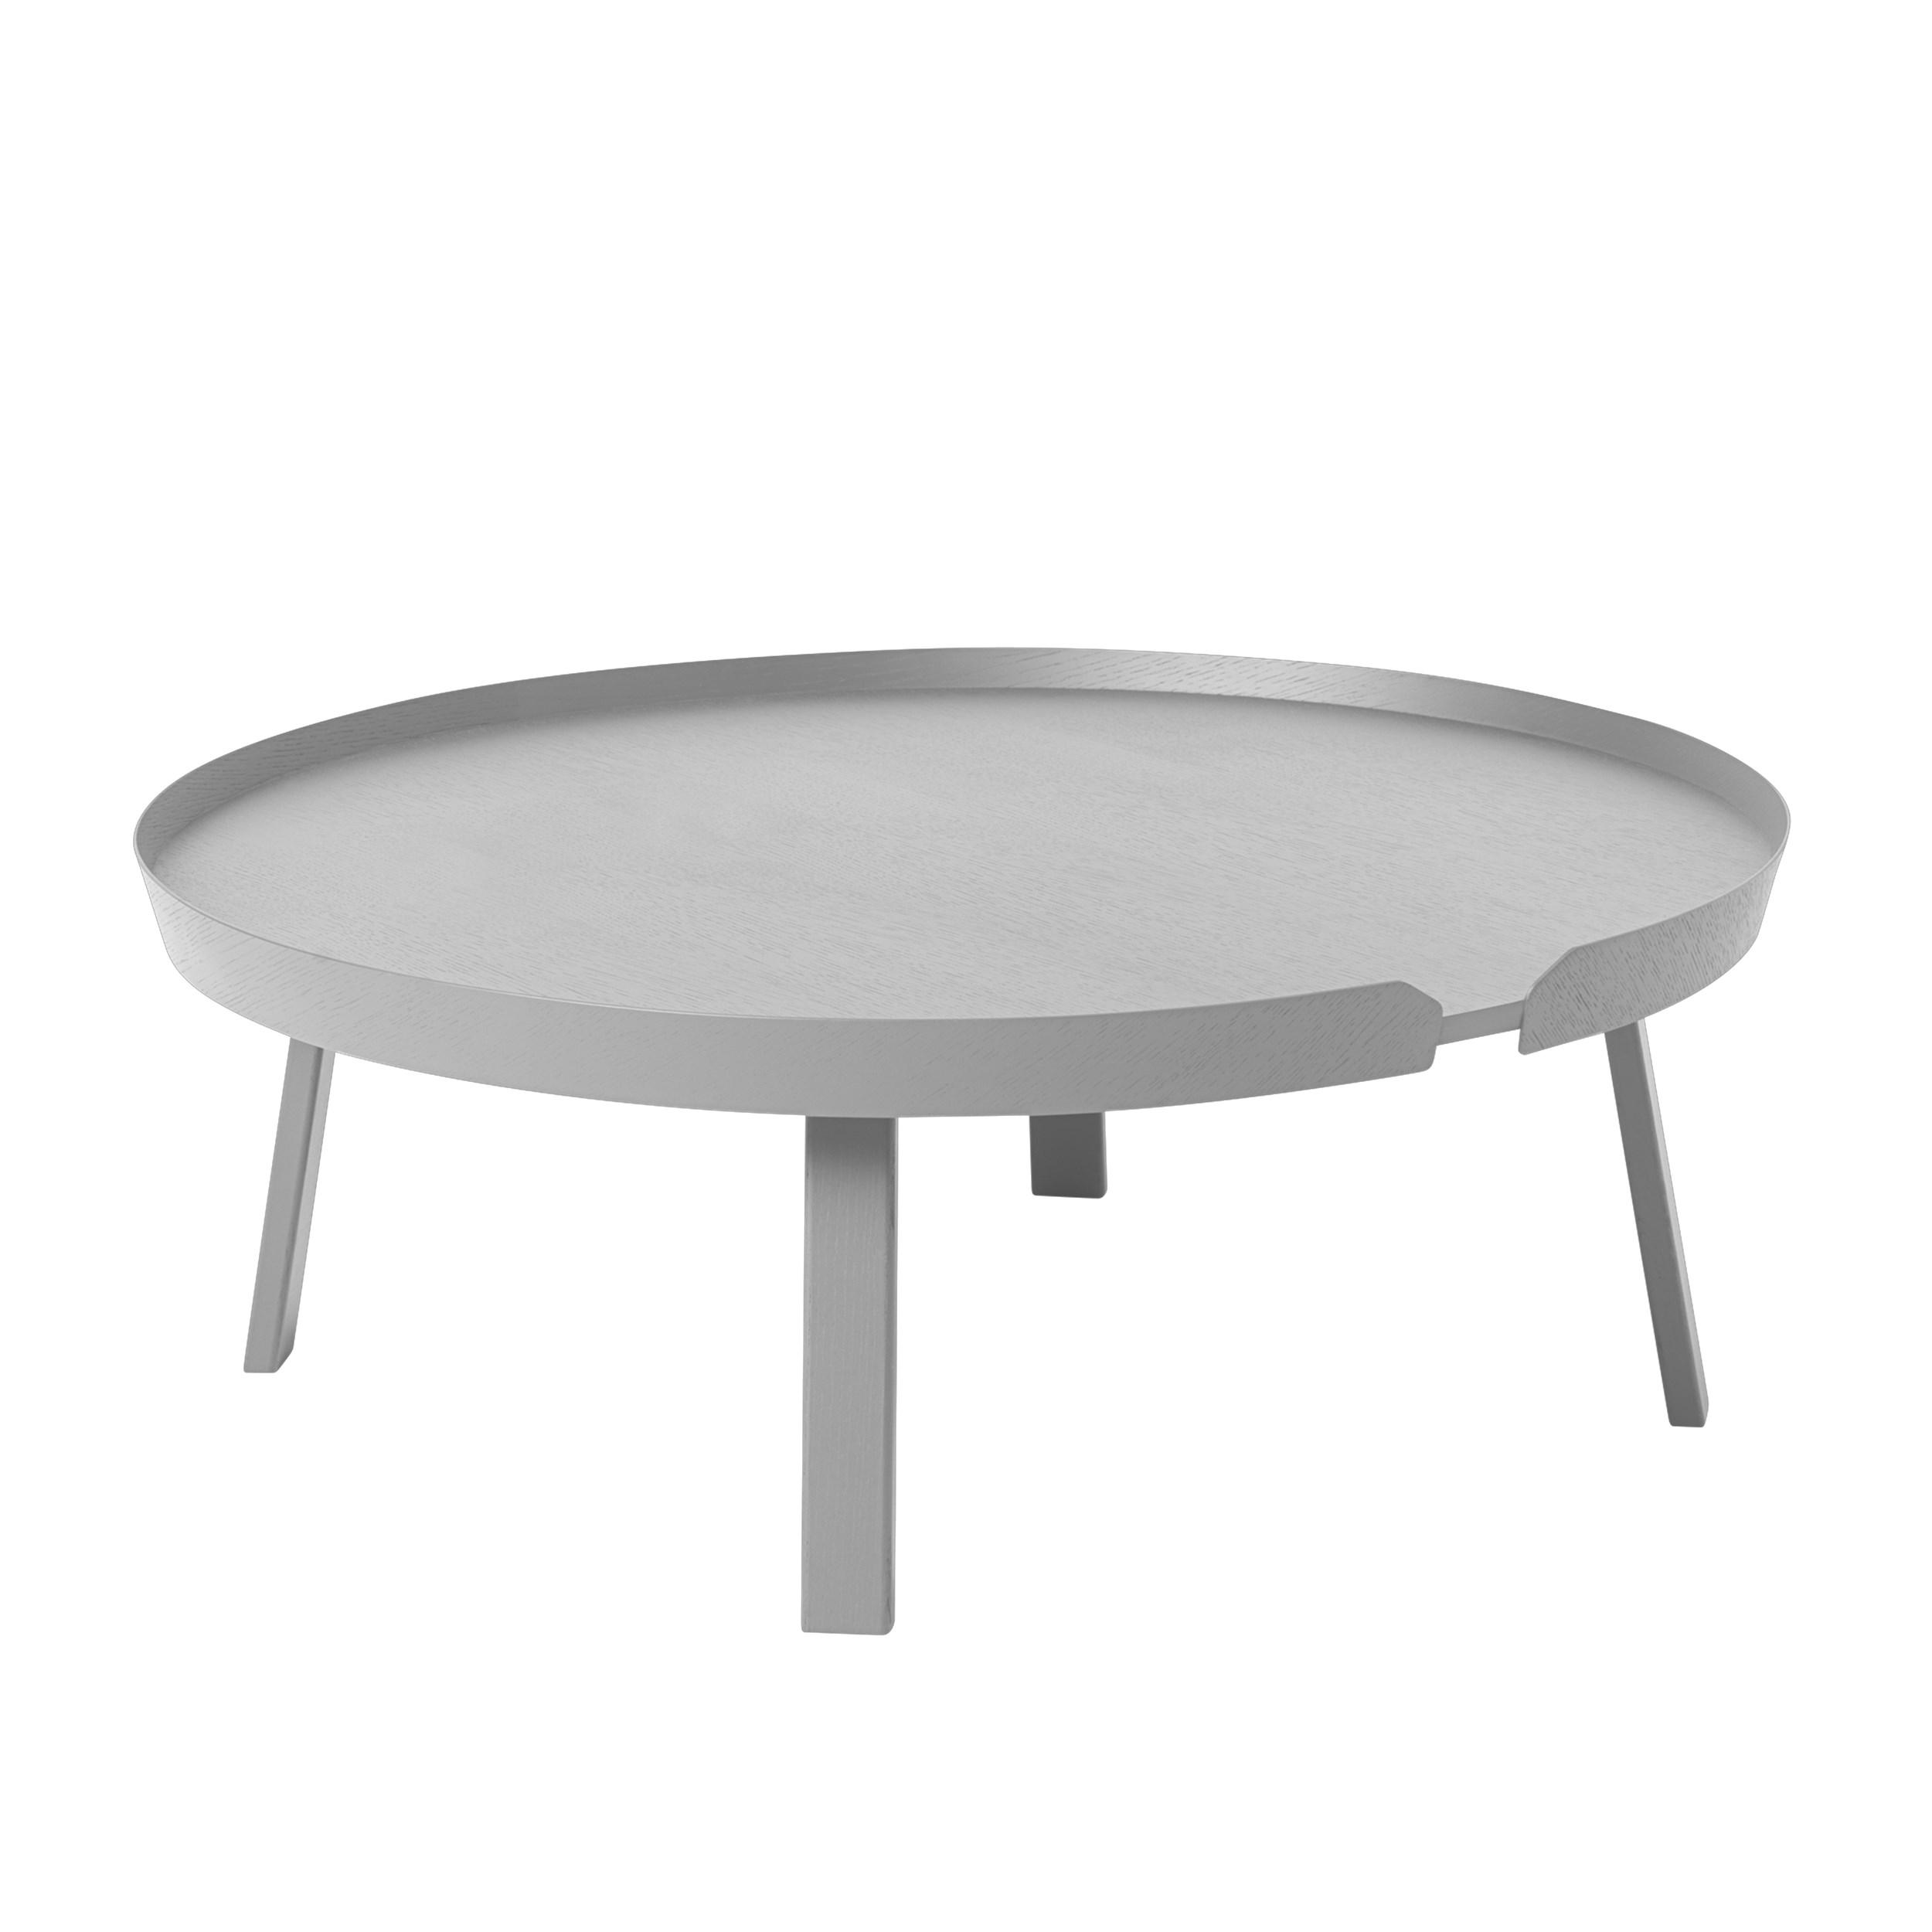 Around coffee table extra large grey